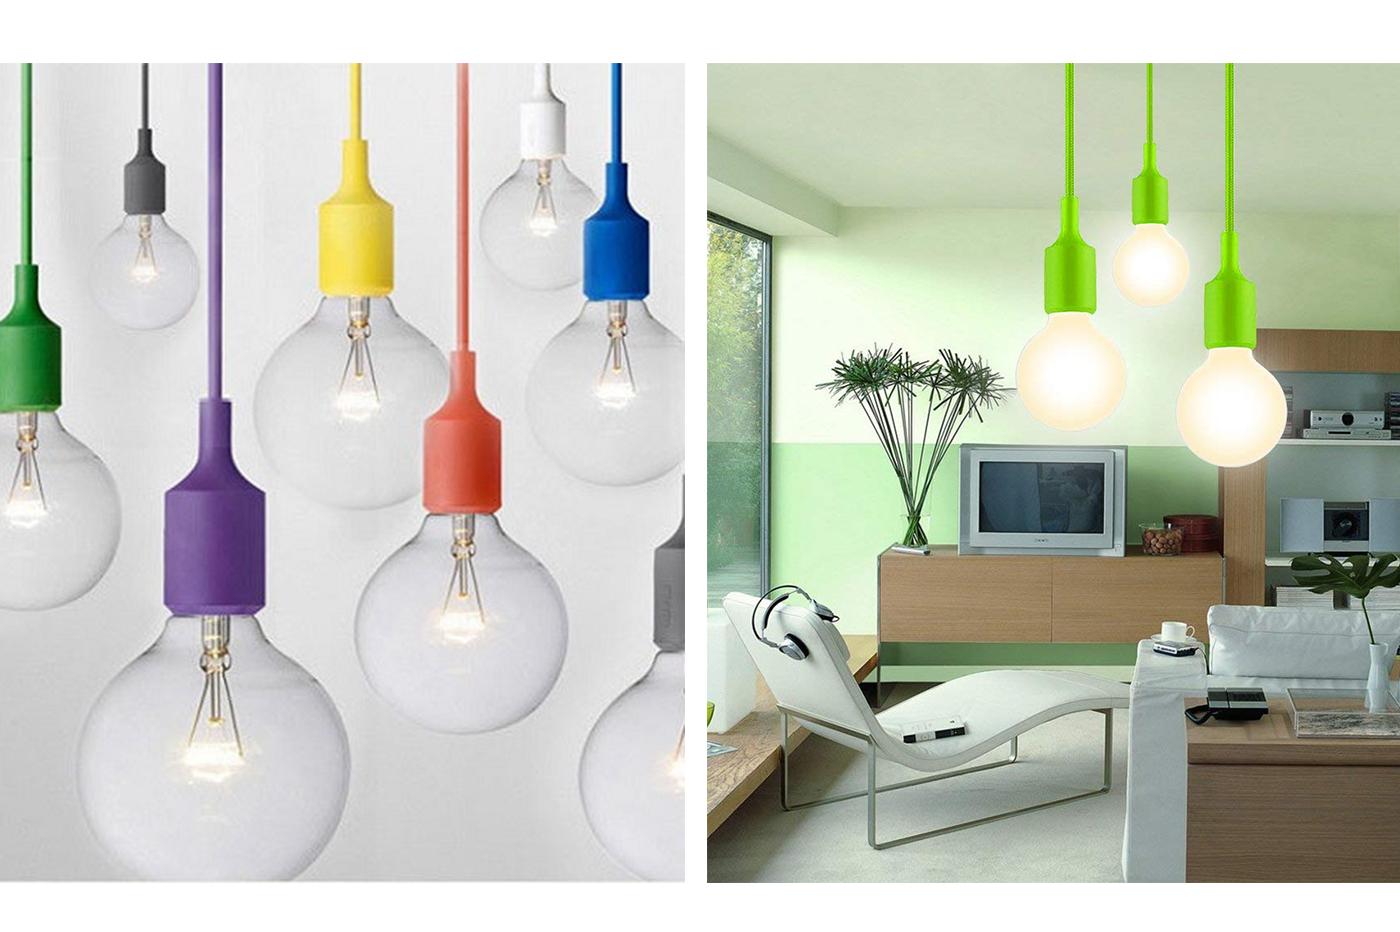 Bes 24975 lampadari beselettronica porta lampada sospensione